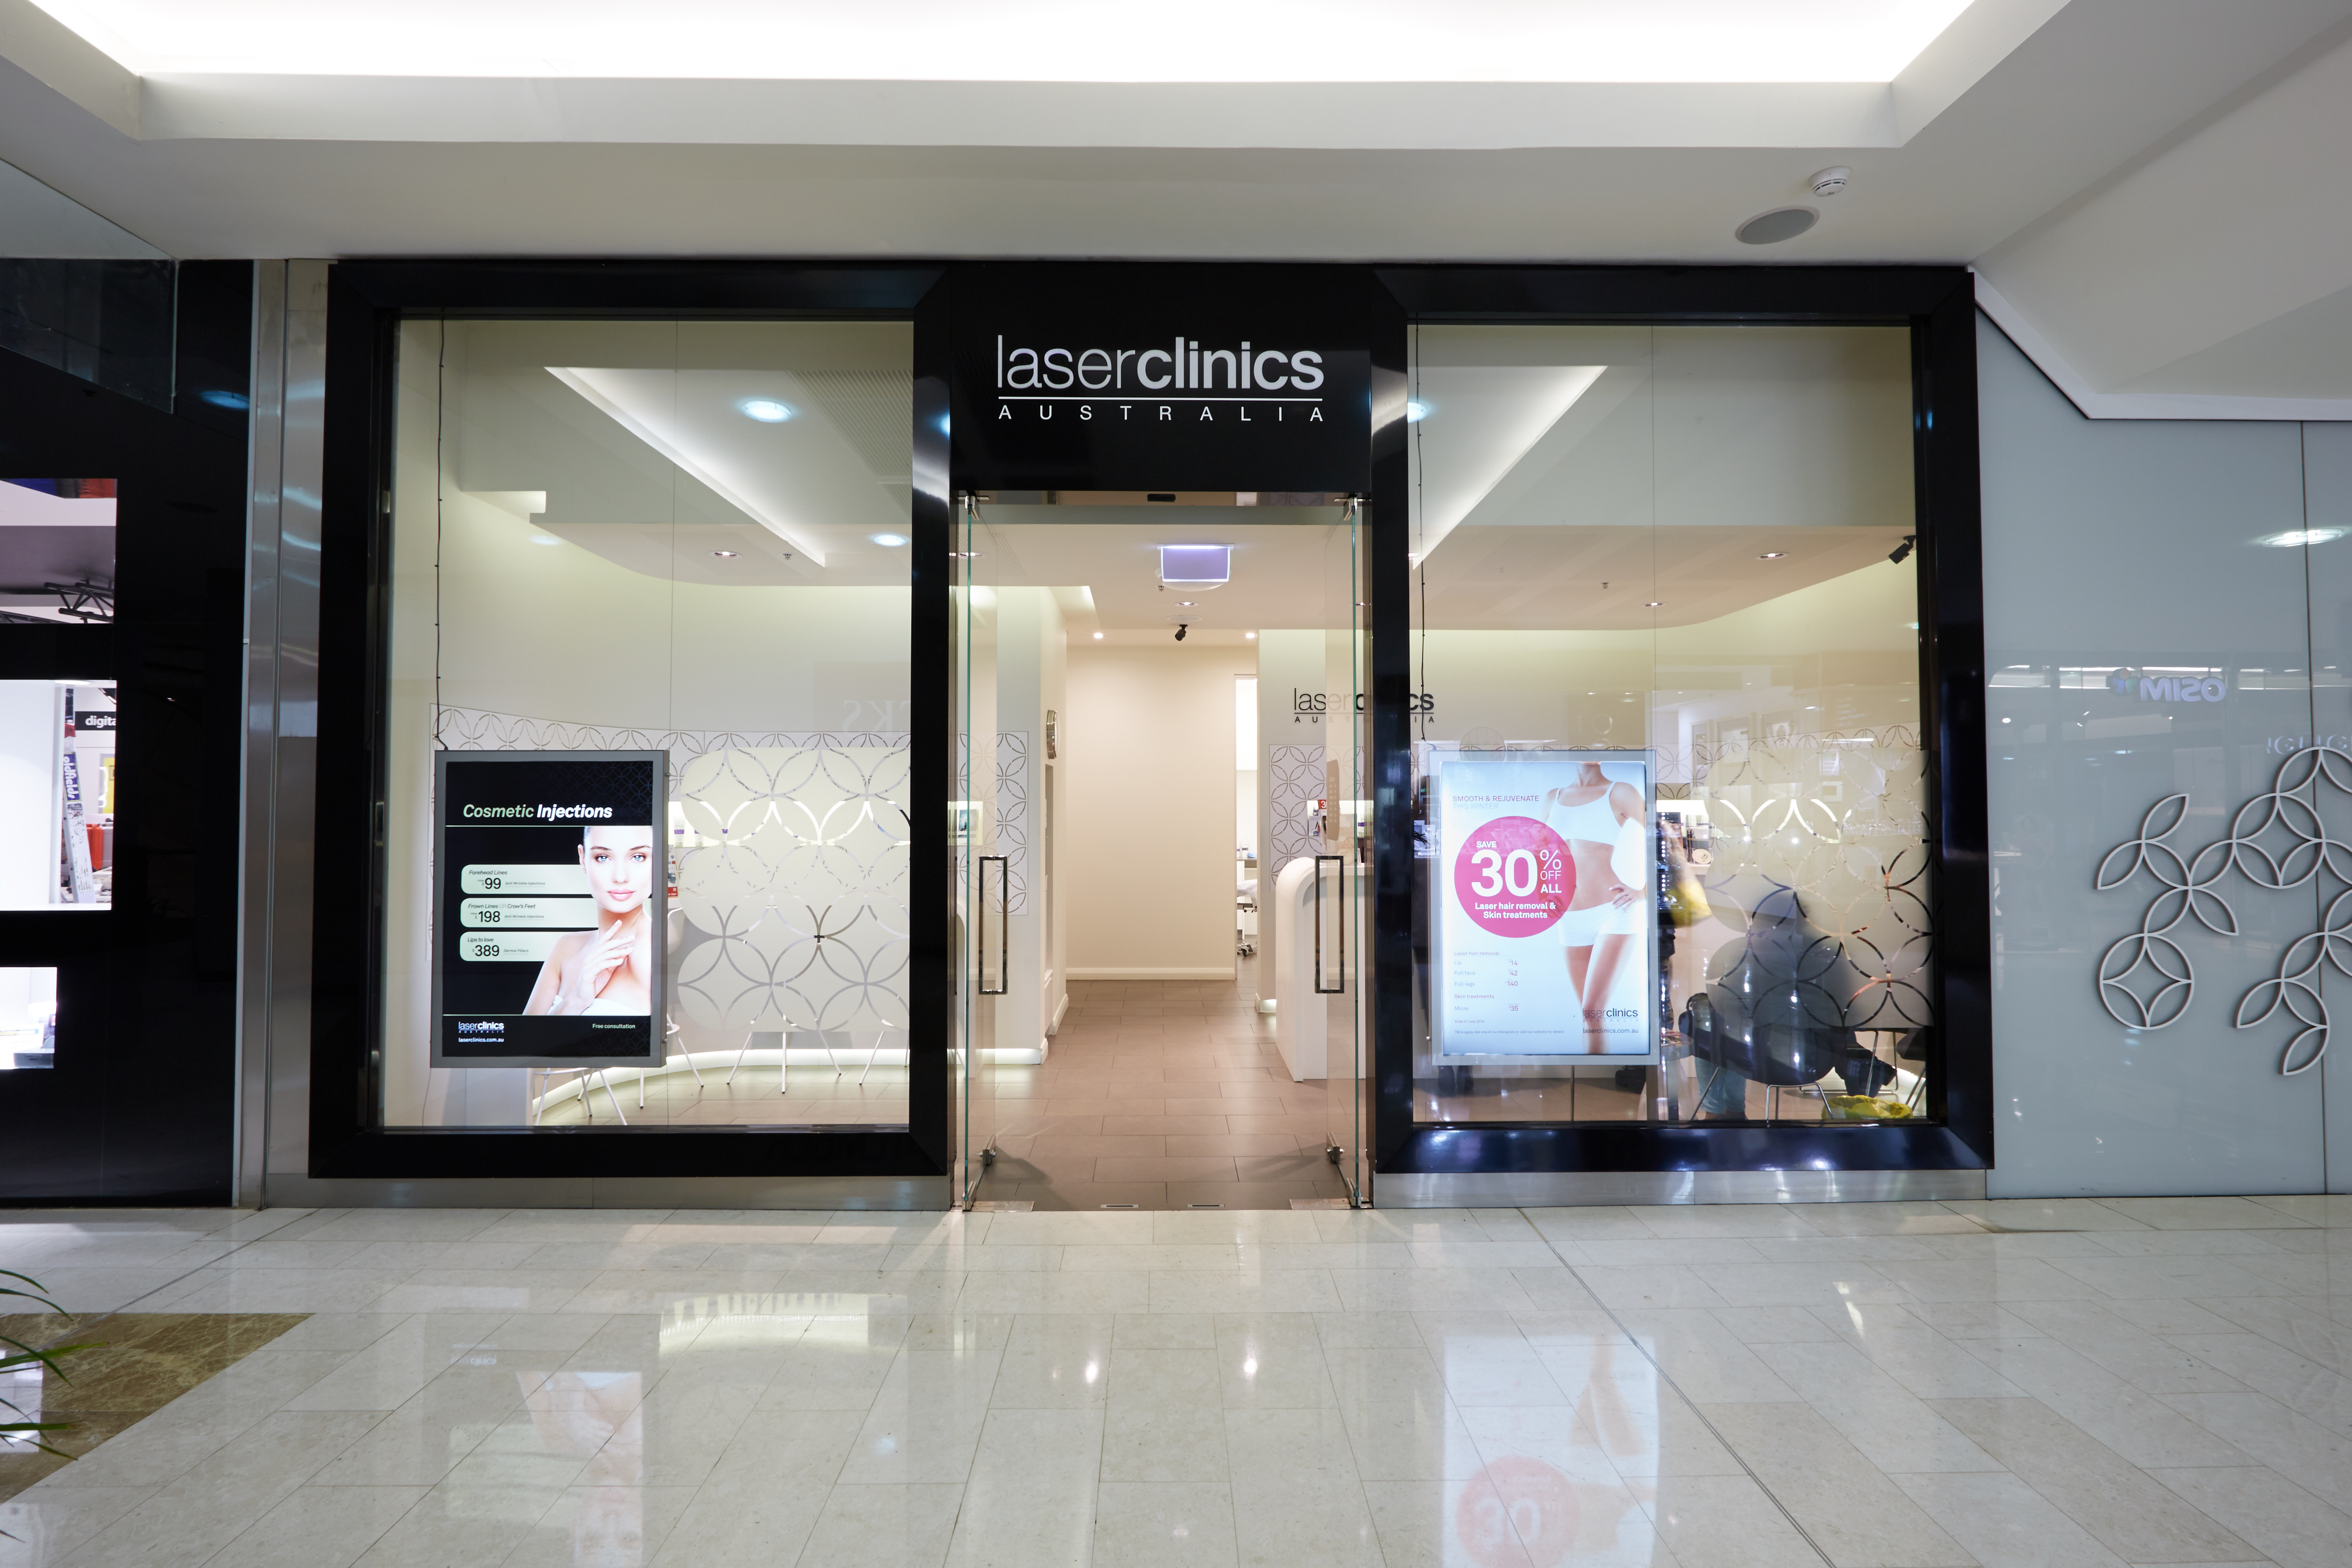 laser-clinics-australia-parramata-westfield-01